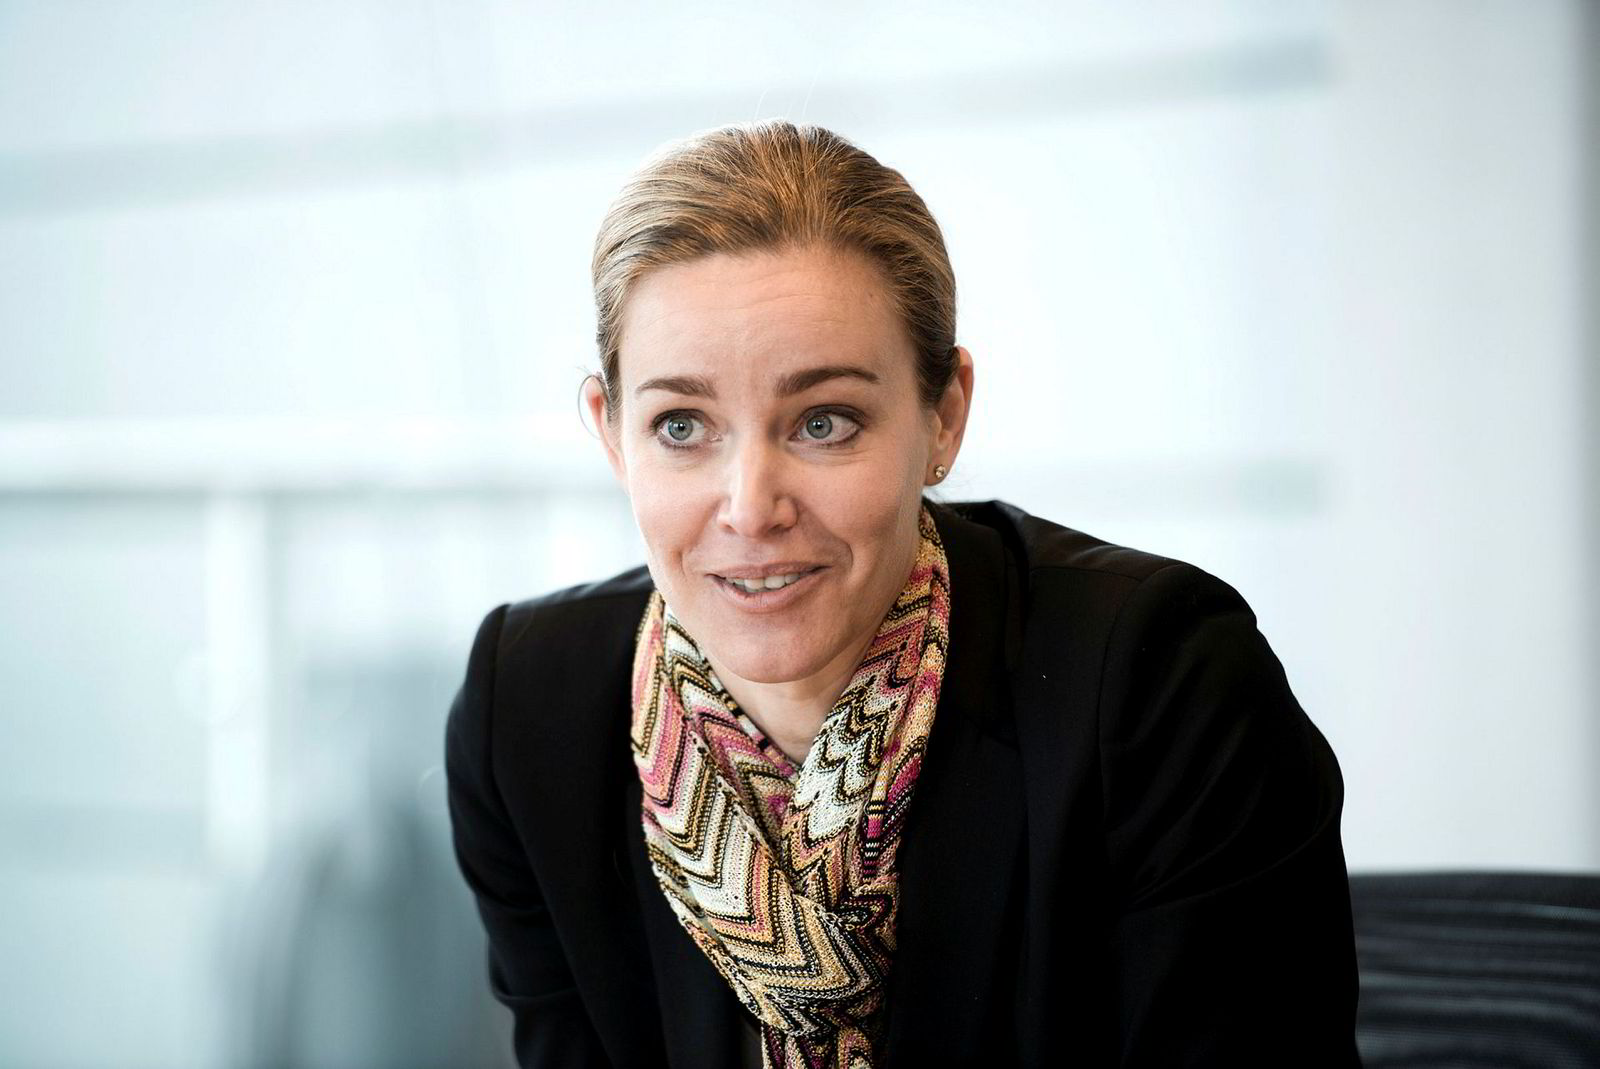 Finansdirektør Rebekka Glasser Herlofsen tar plass i Sats-styret.